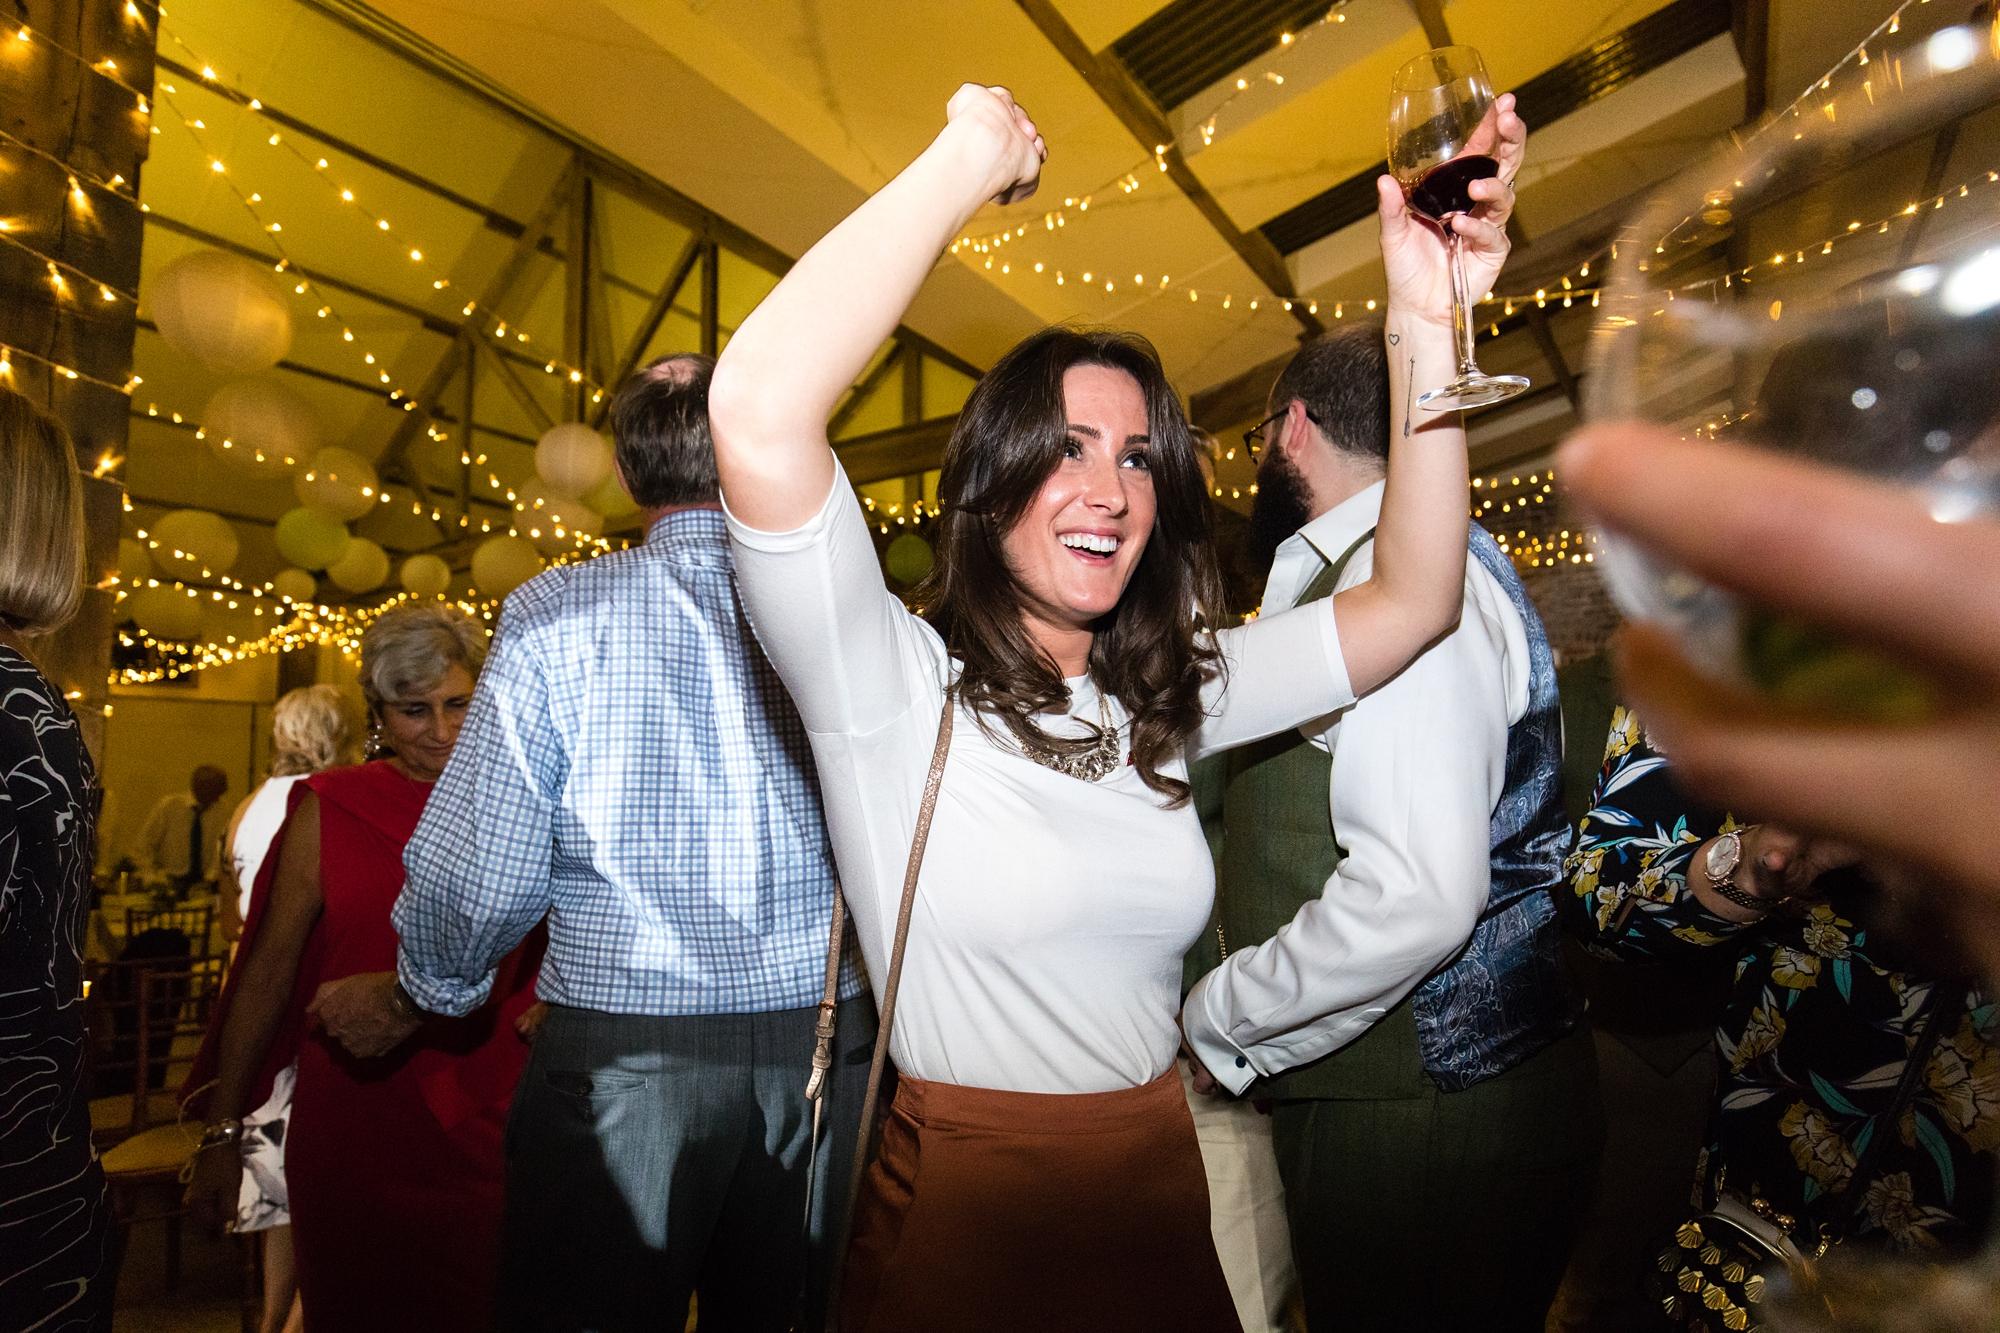 York Wedding Photography at Barmbyfield Barns dancing party photograph